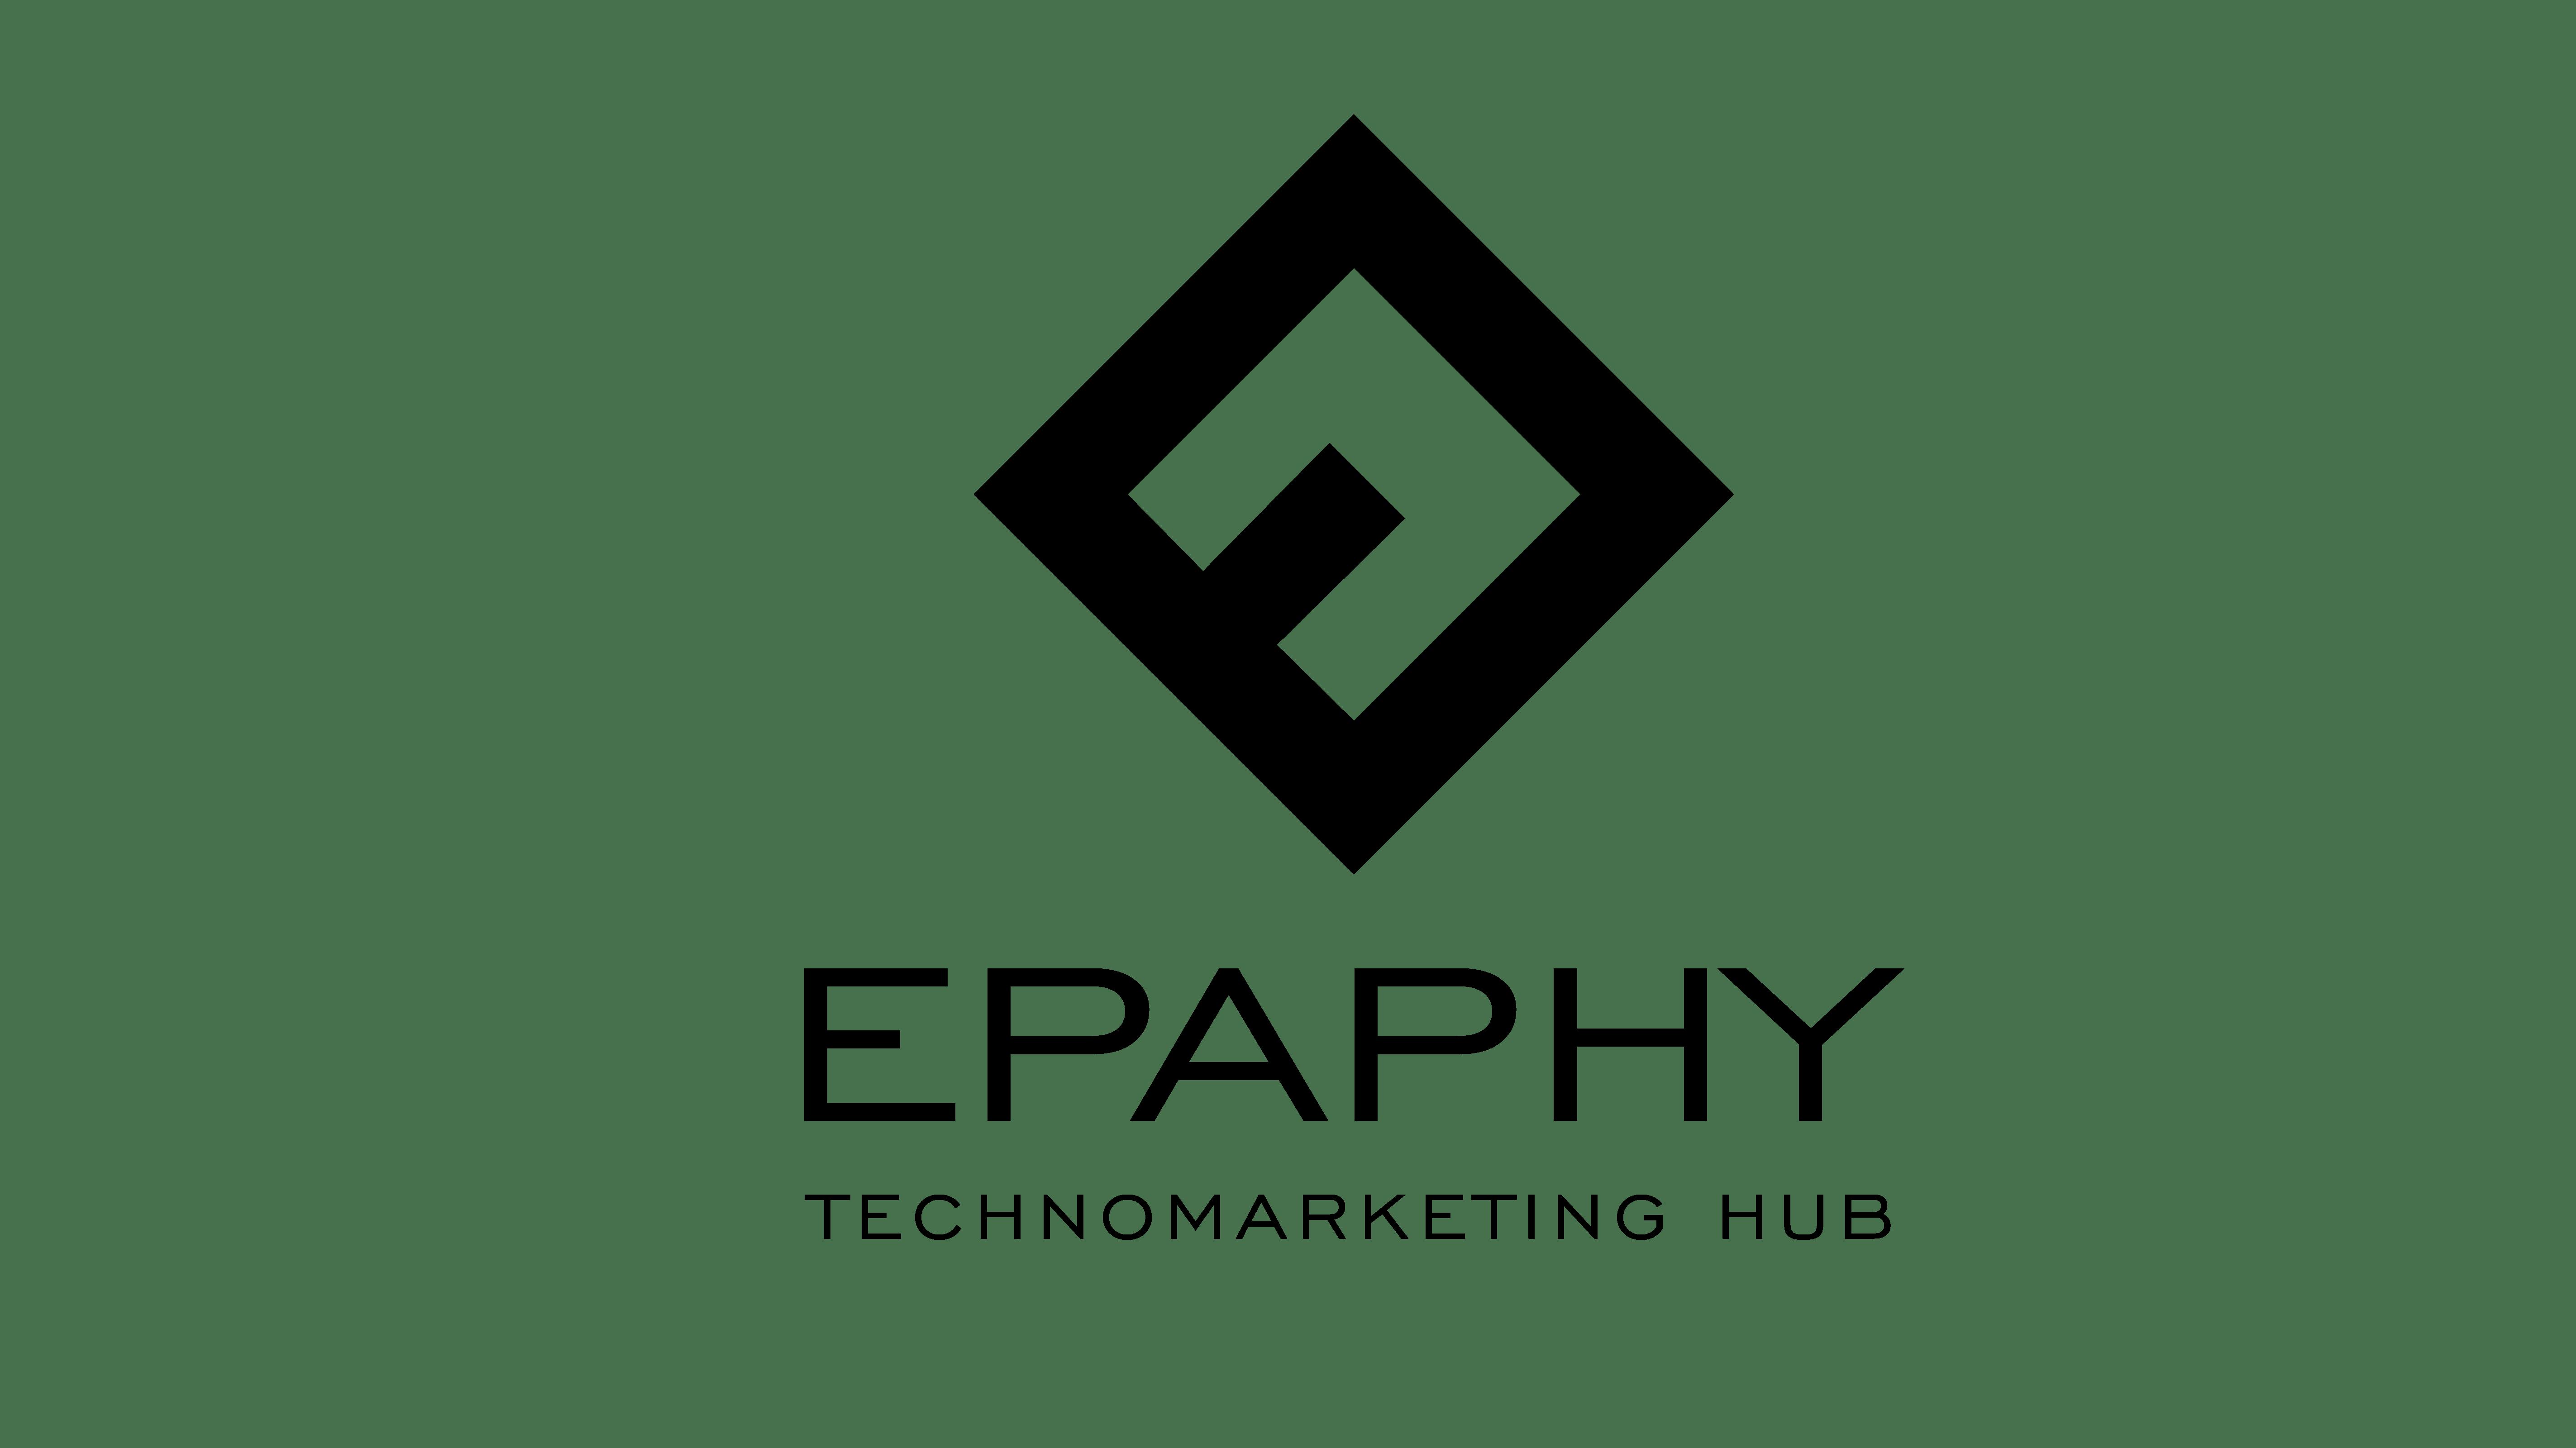 EPAPHY